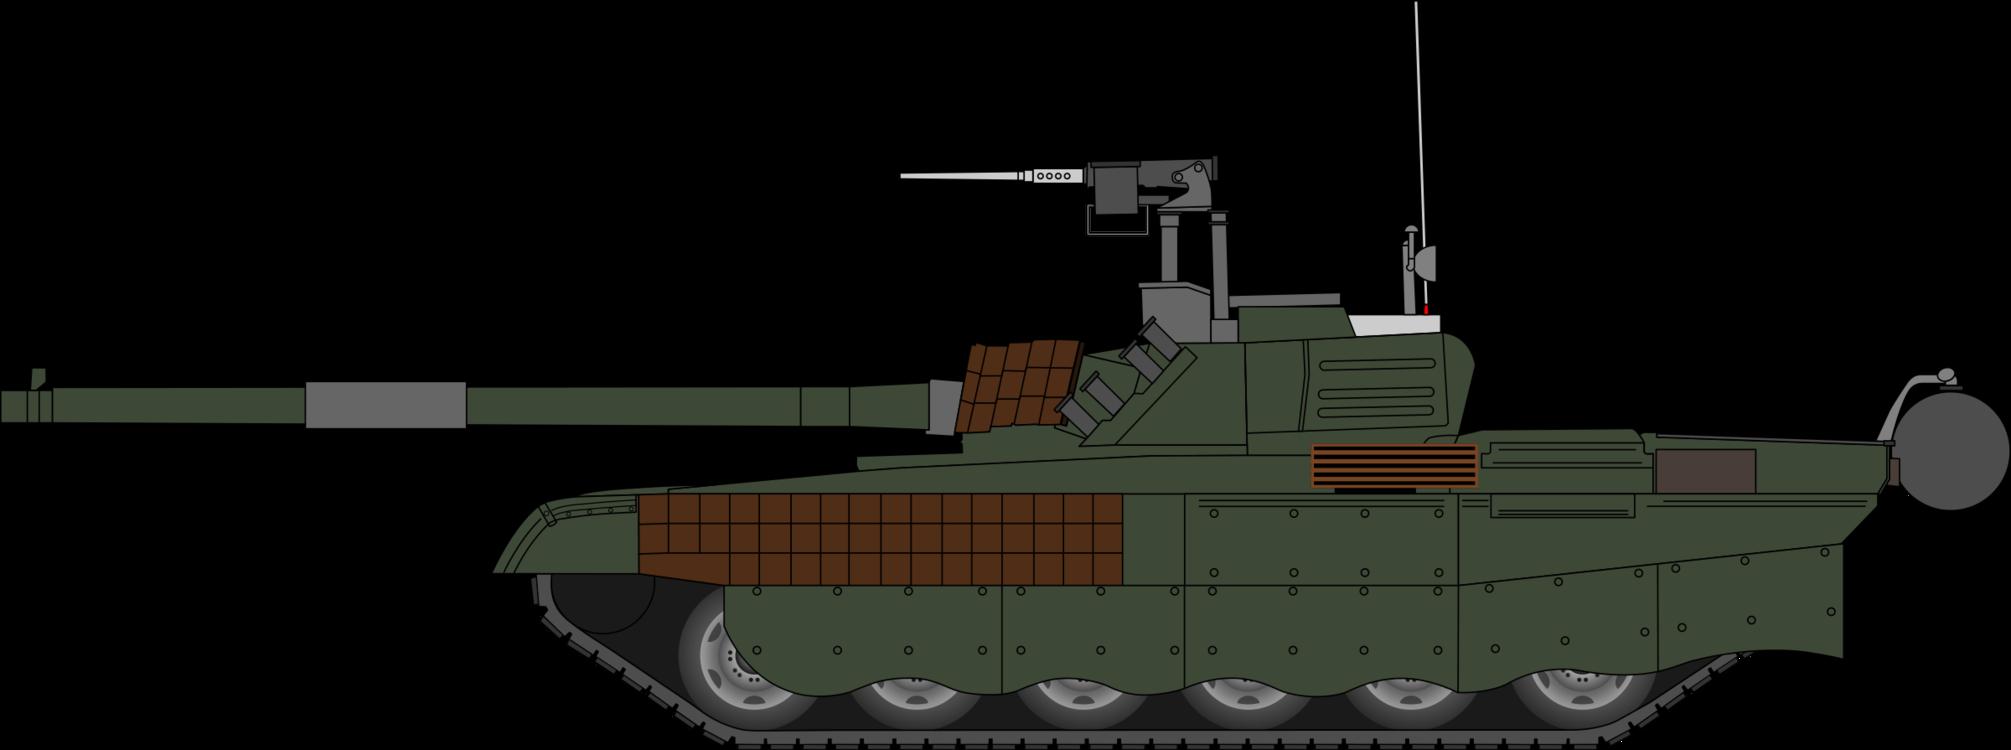 Tank,Churchill Tank,Weapon